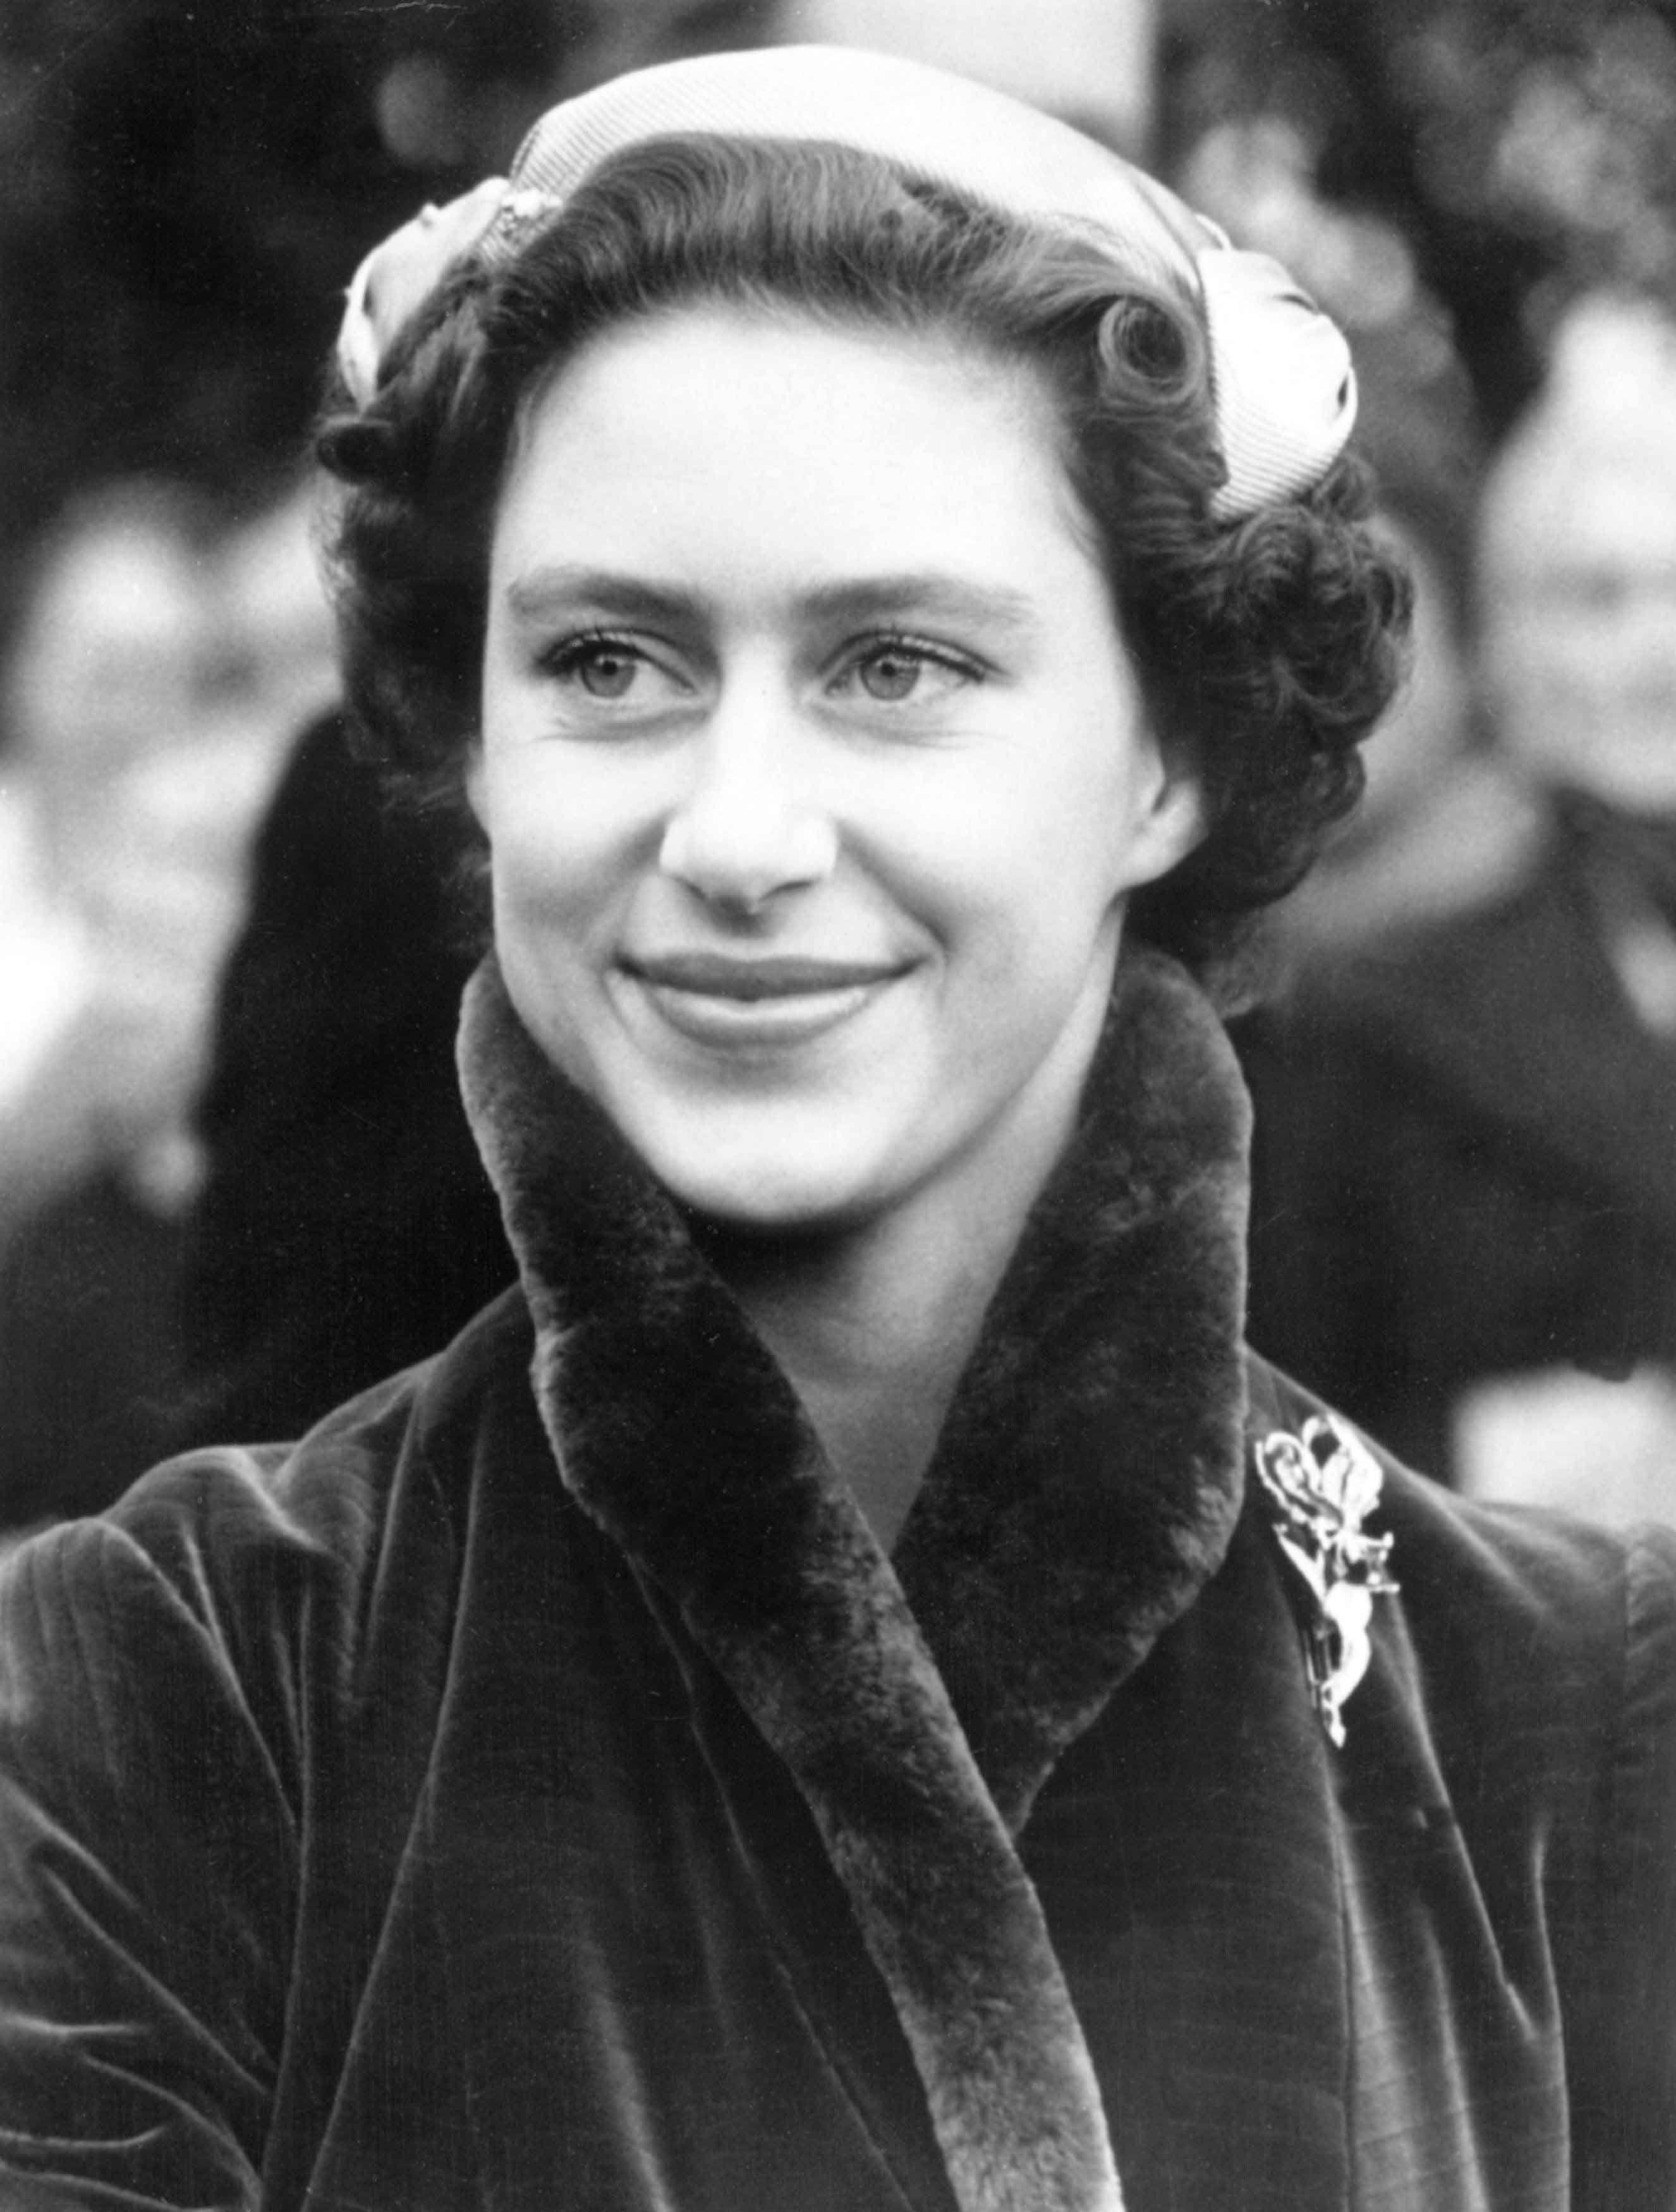 Princess Margaret S Life In Pictures Beautiful Photos Of Queen Elizabeth Sister